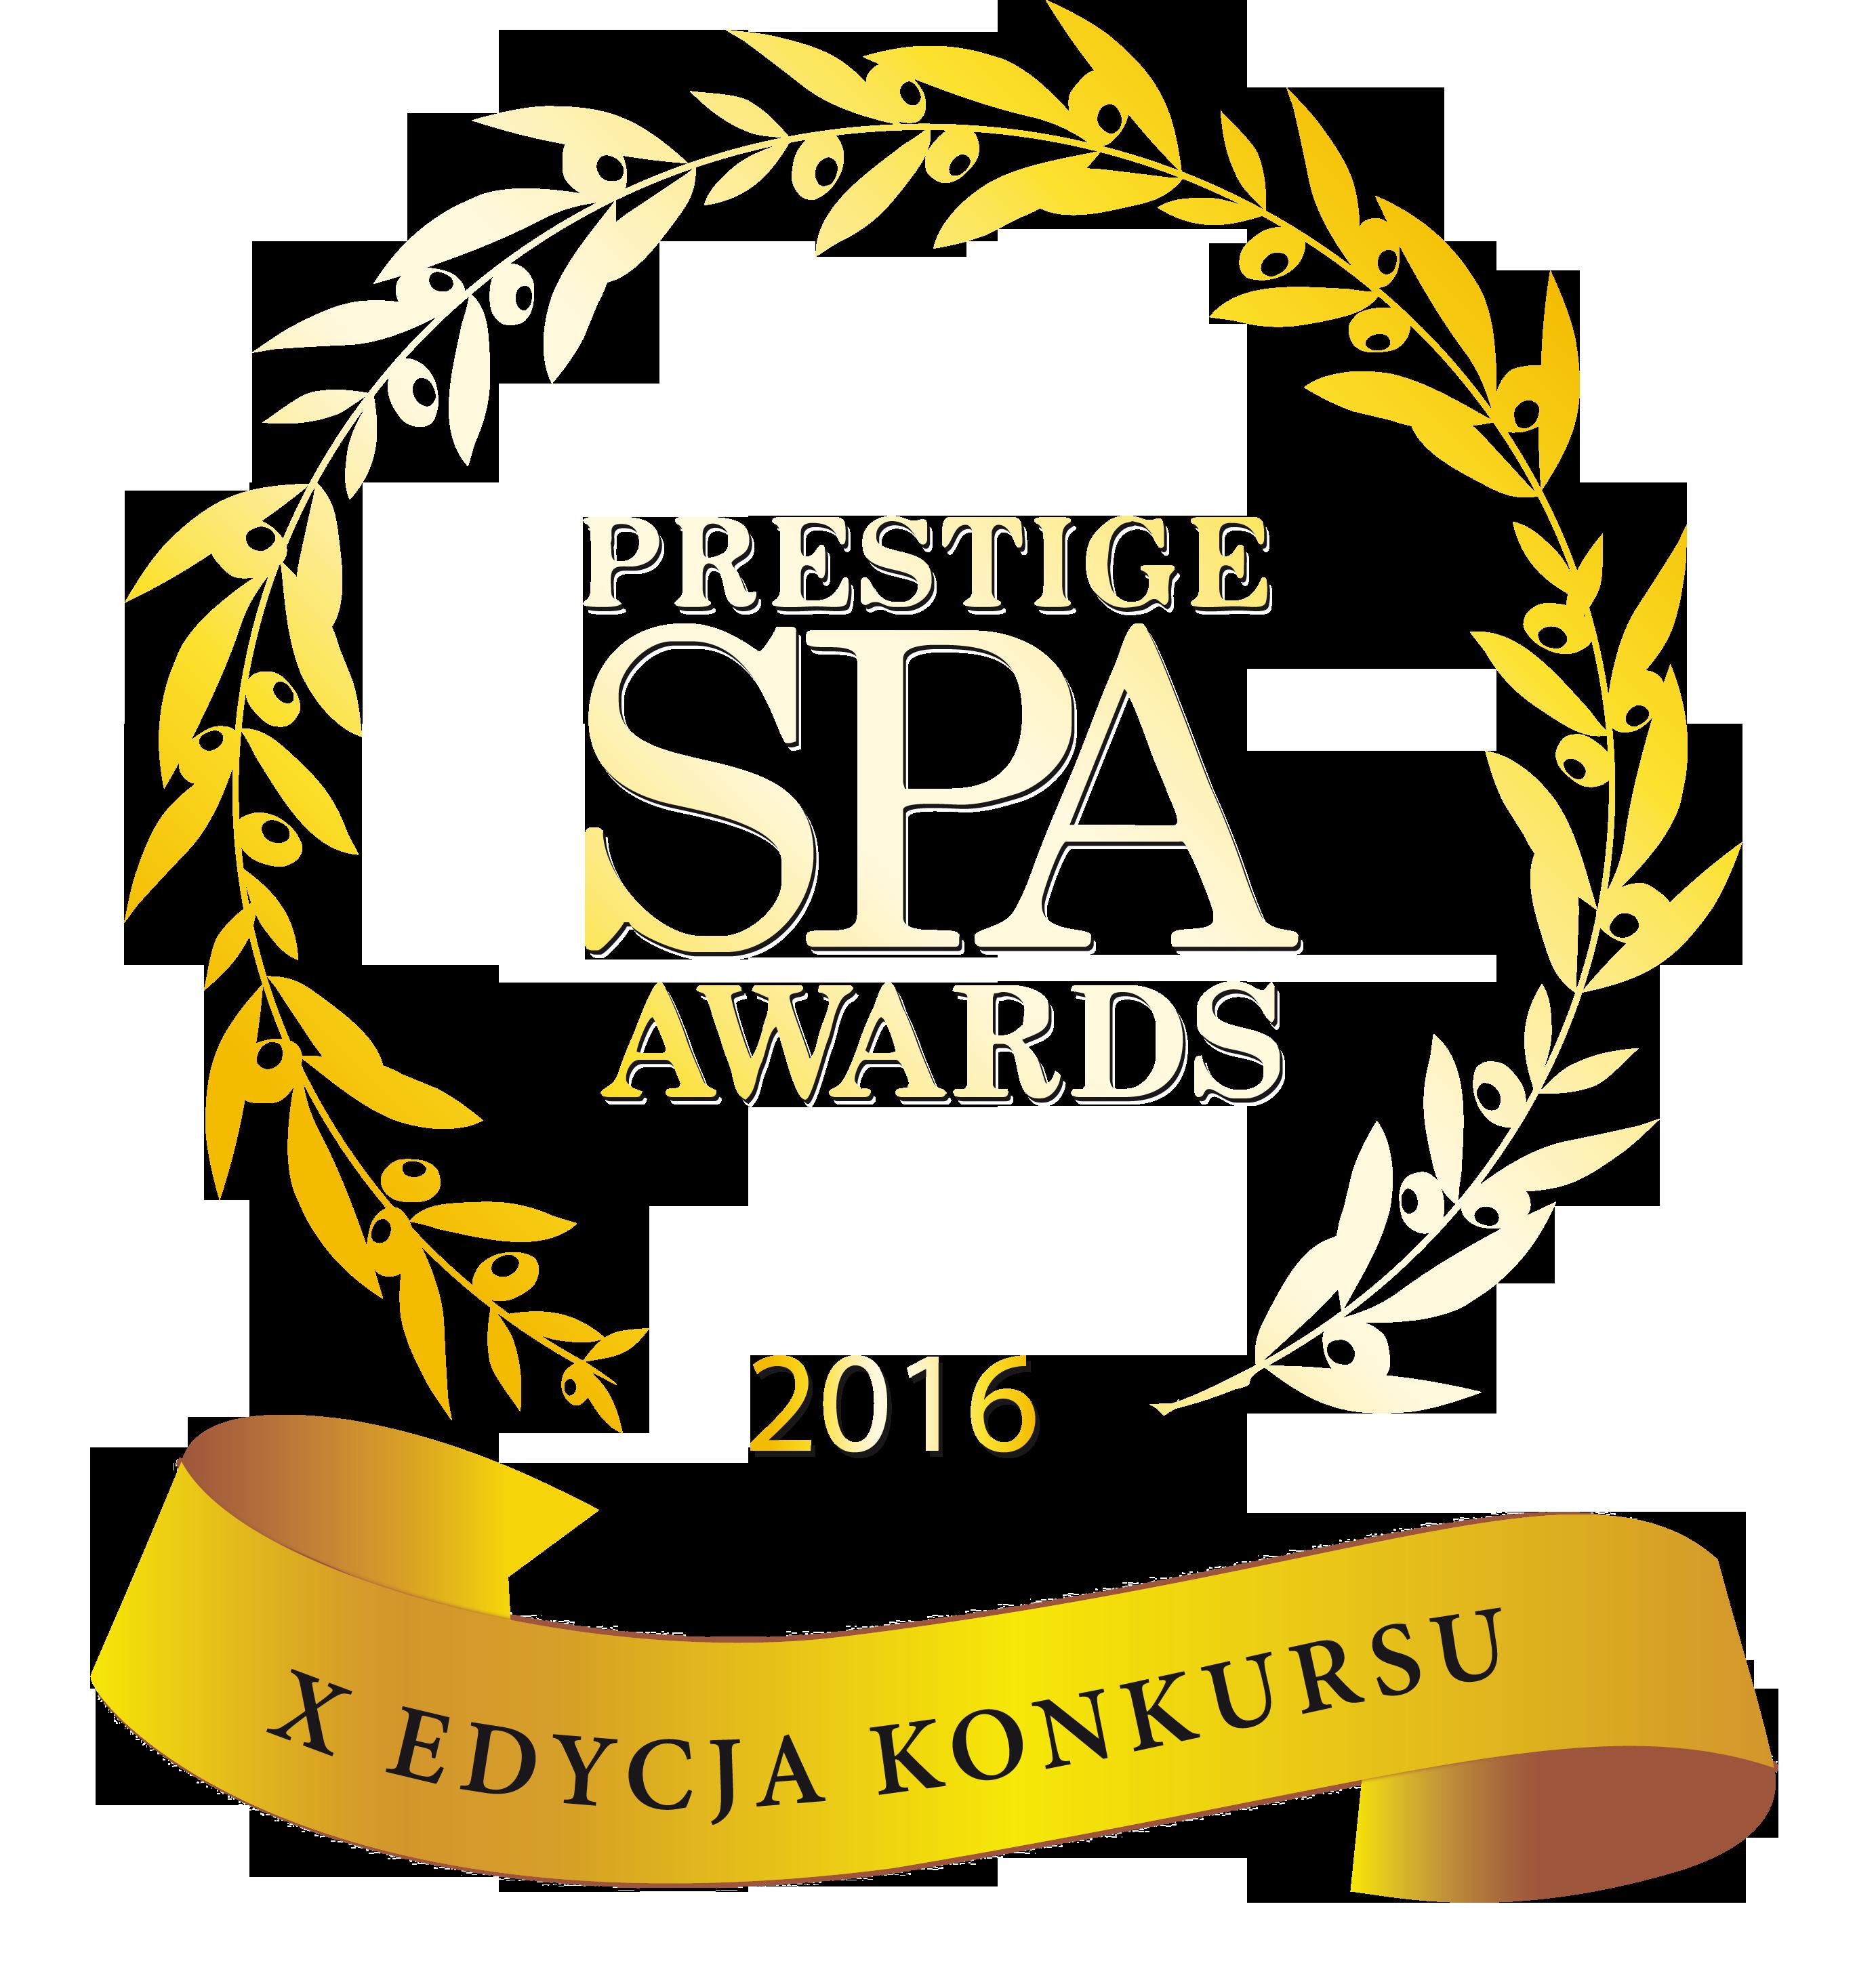 Spa Prestiga Awards 2016 - Najlepsze Destination SPA w Polsce